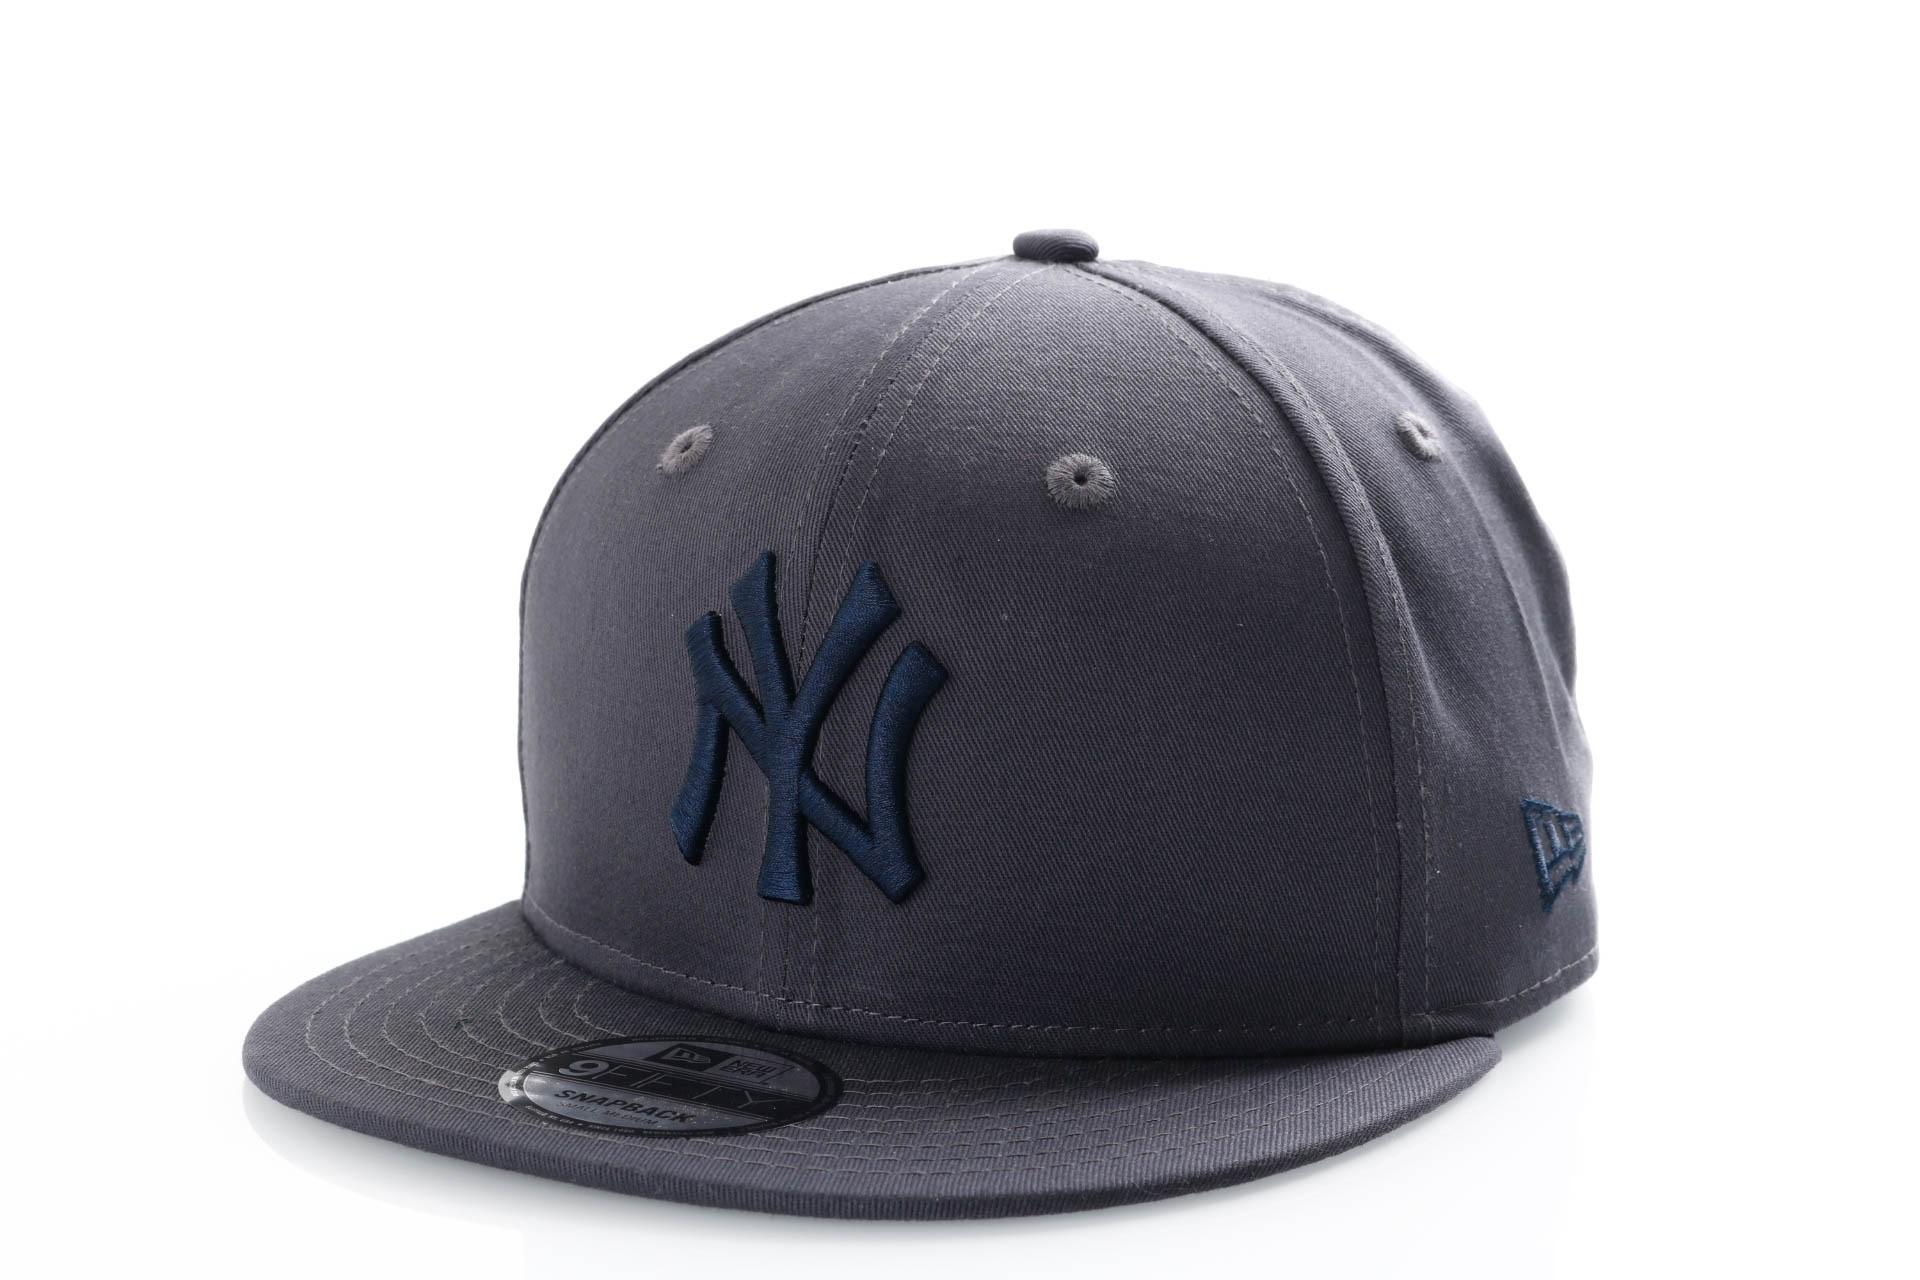 91f708314ff New Era Mlb 9Fifty 11871431 Snapback Cap Graphite Navy Mlb New York Yankees